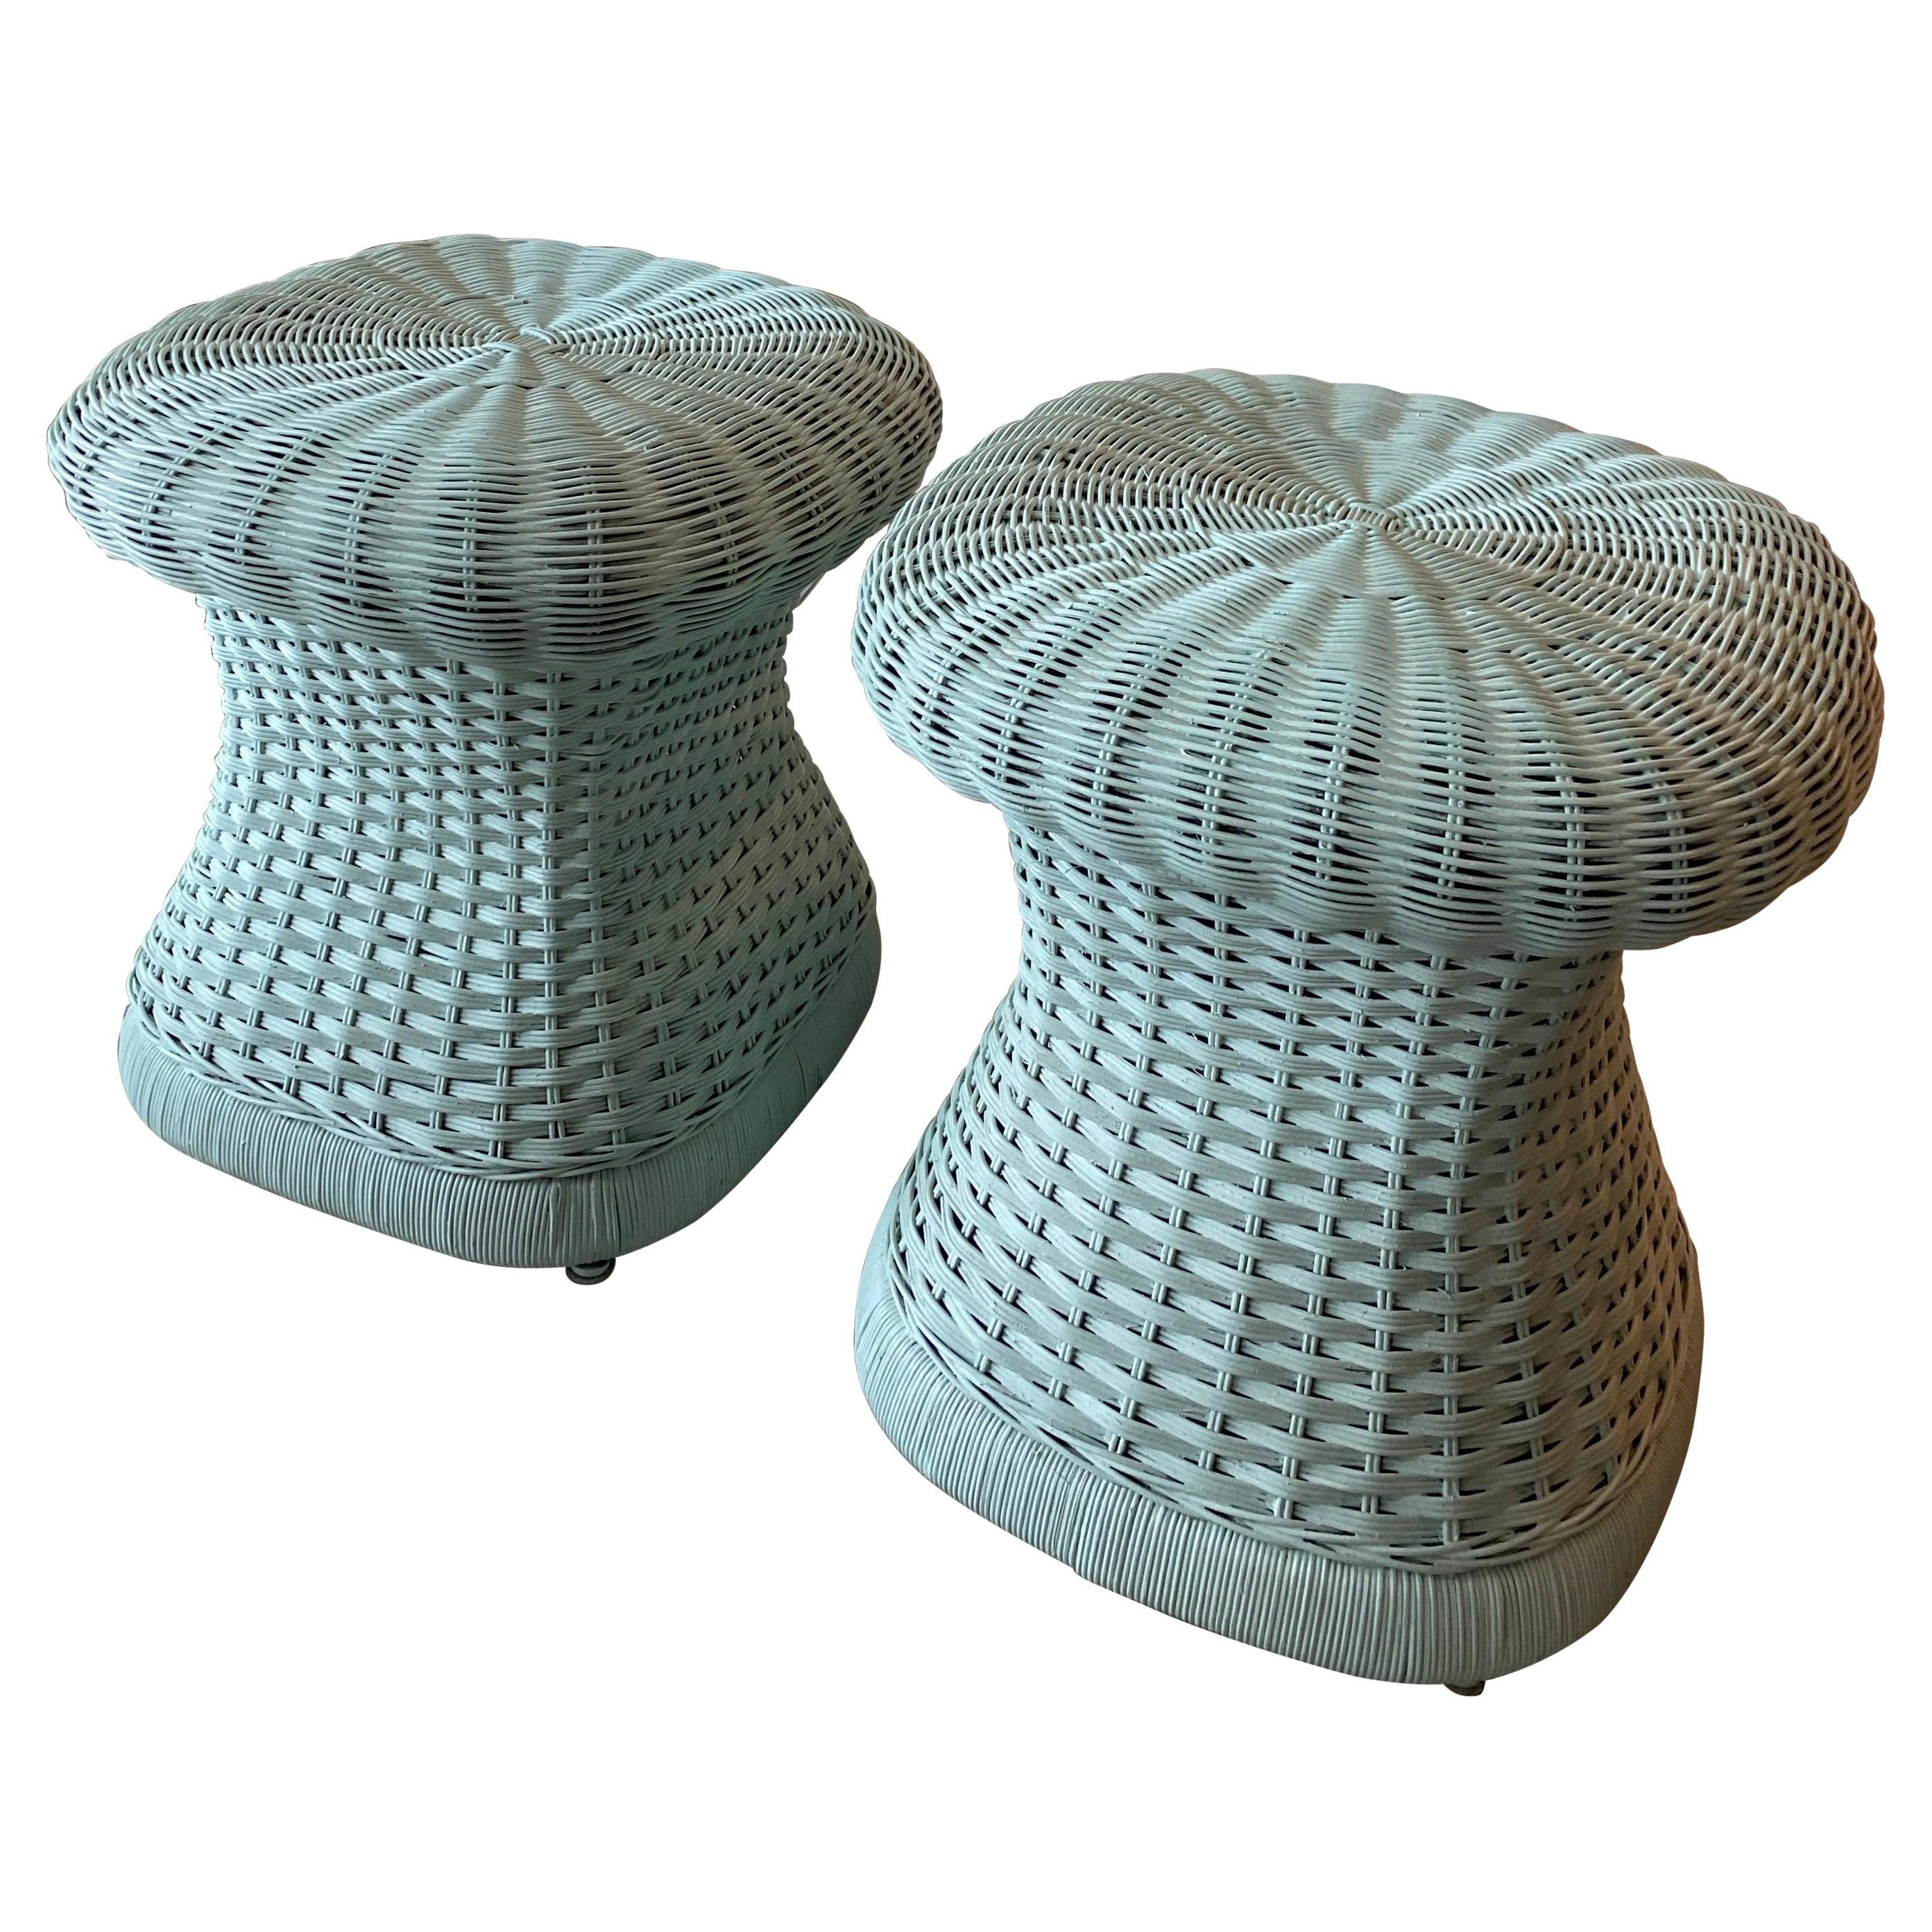 Vintage Pair of Wicker Mushroom Shape Benches Stools